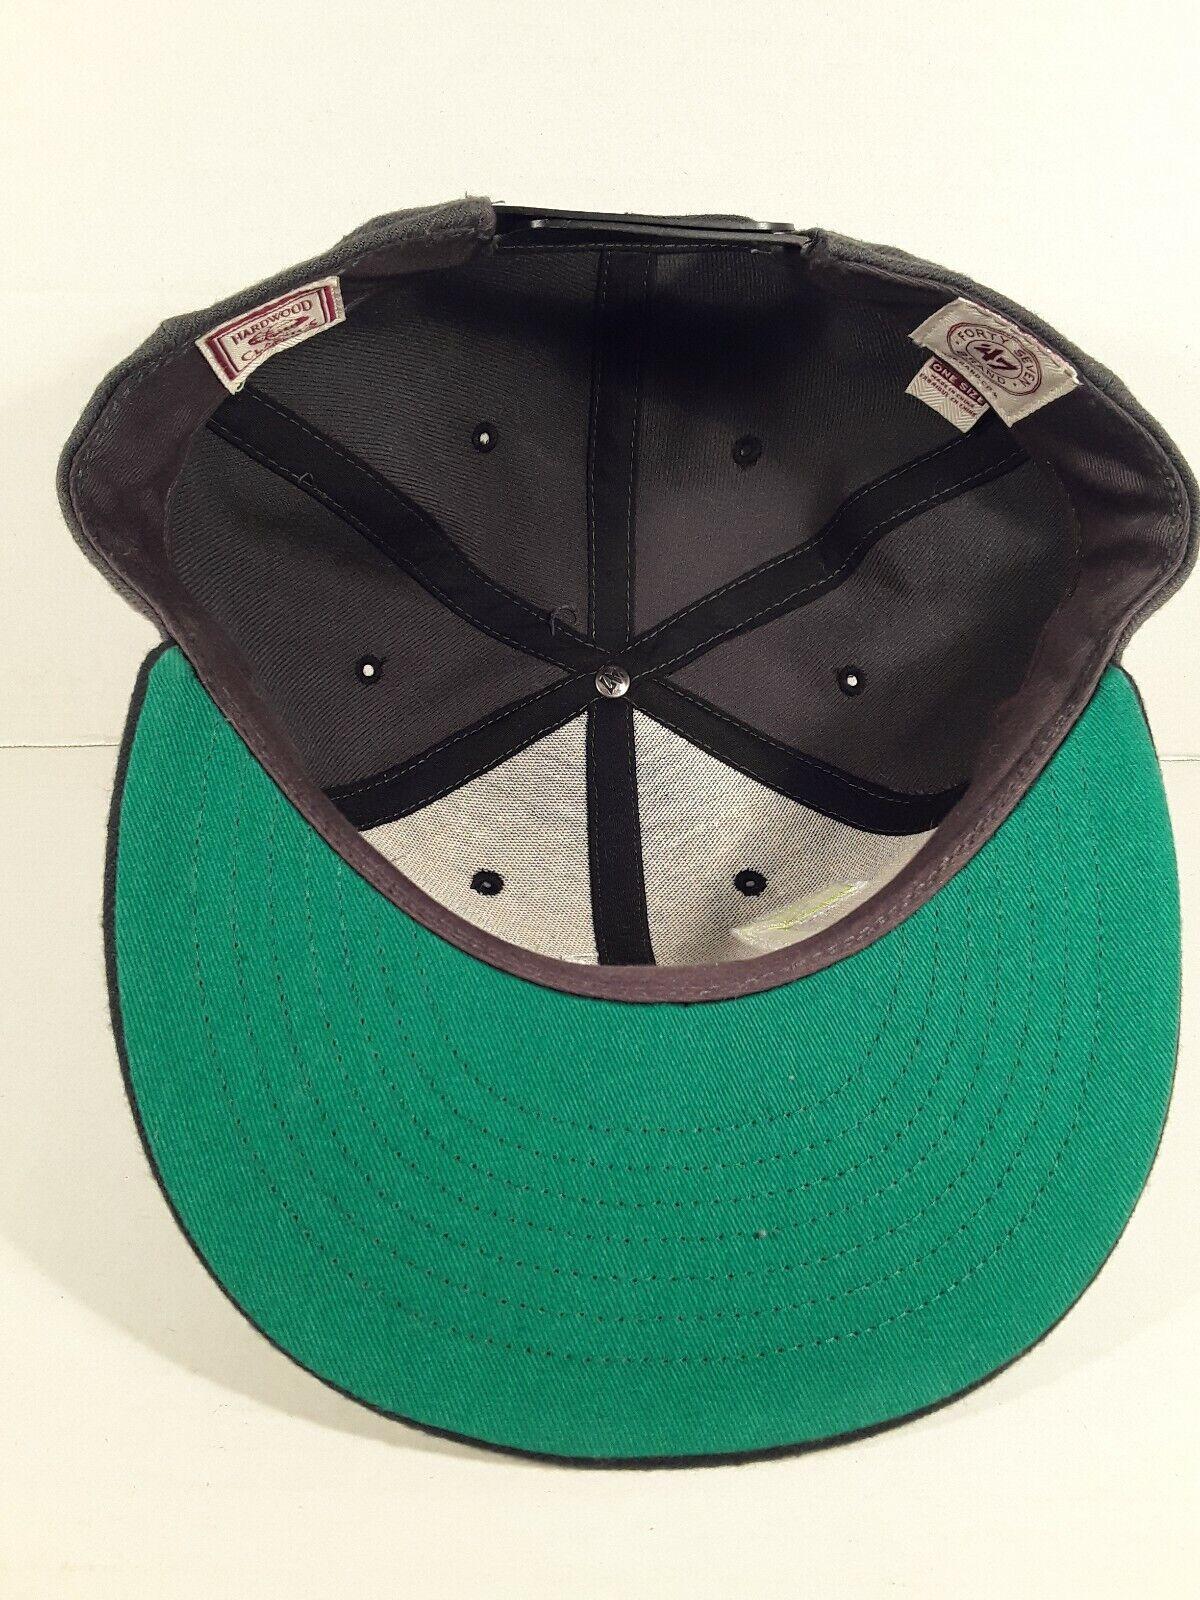 Brand New Utah Jazz Mash Up Upside Down Hat Cap 47 Brand Green Adjustable